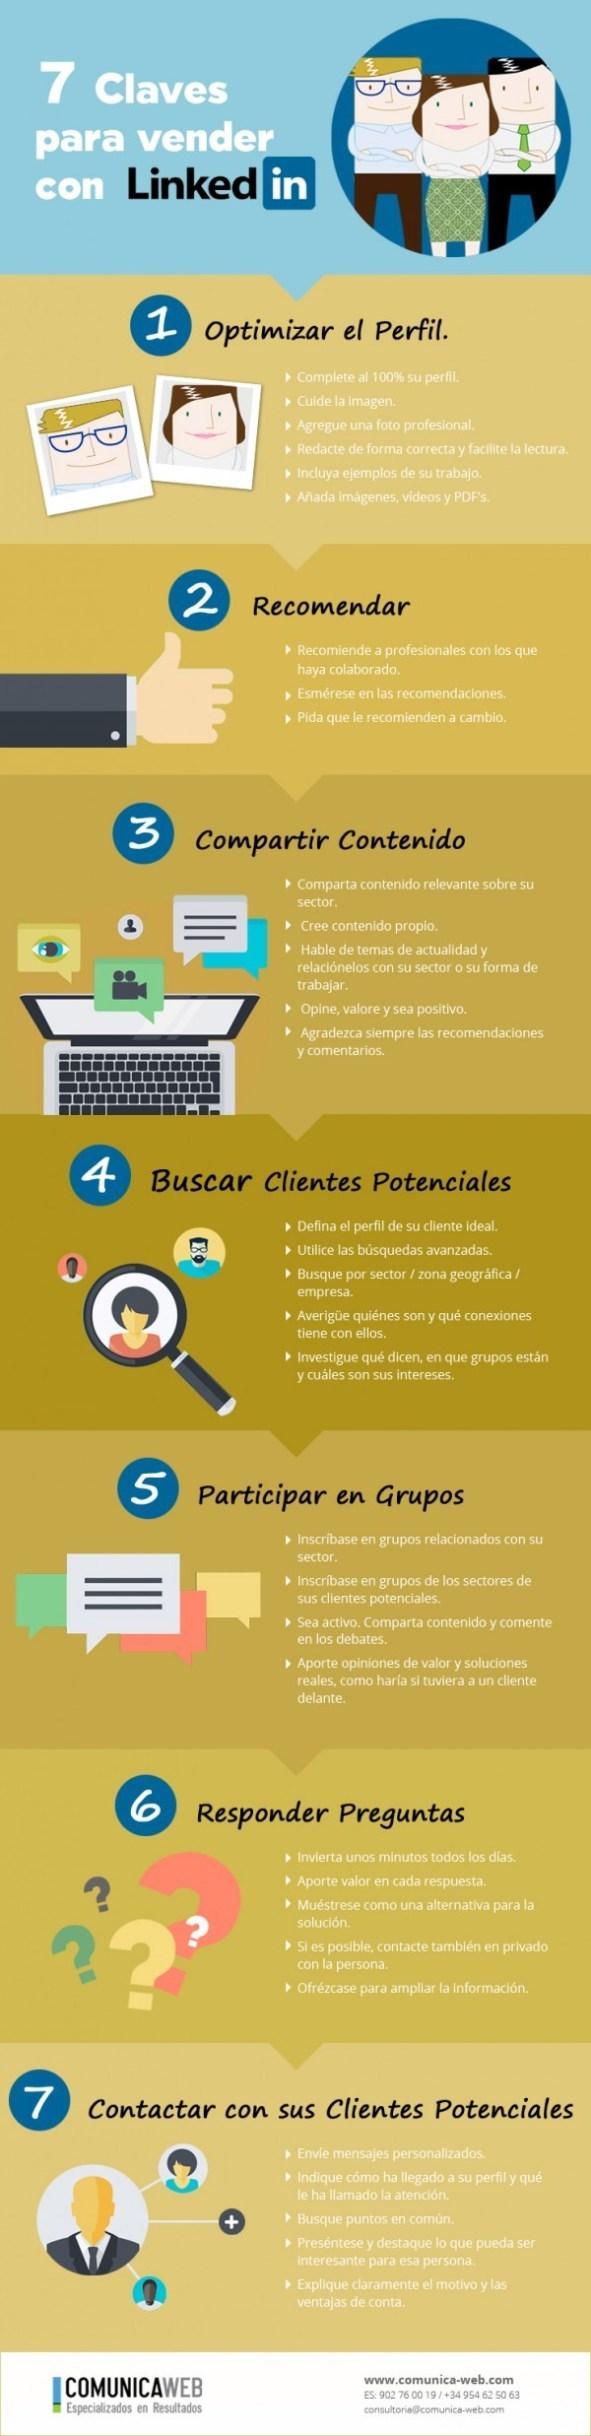 linkedin-estrategia-ventas-infografia